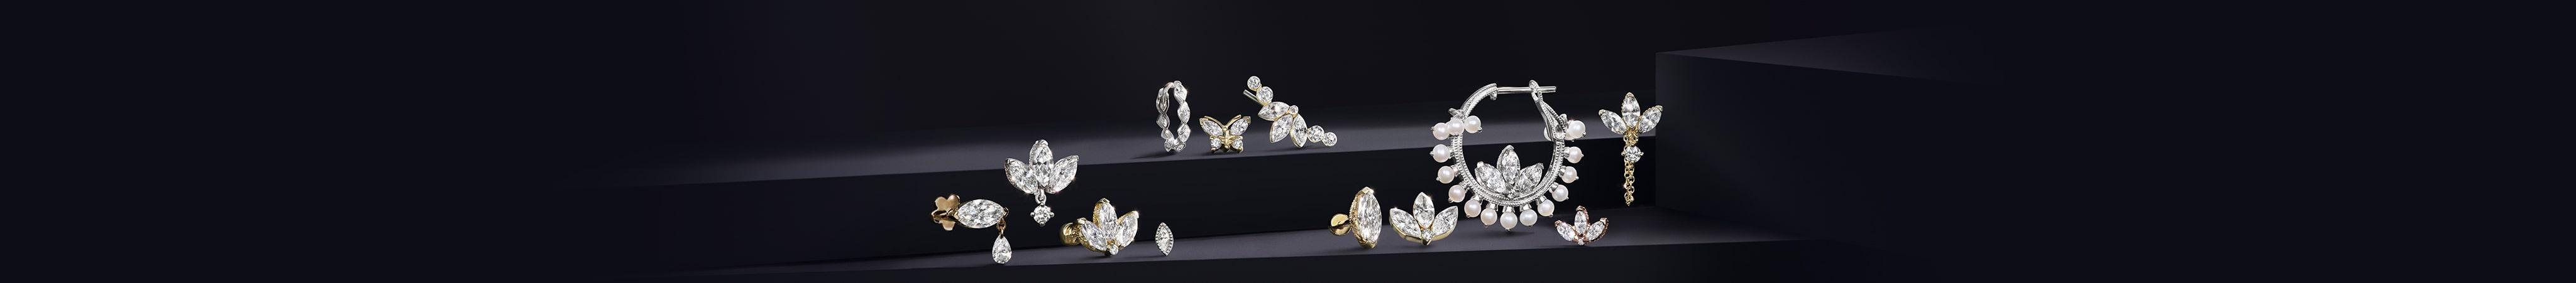 Marquise Jewelry